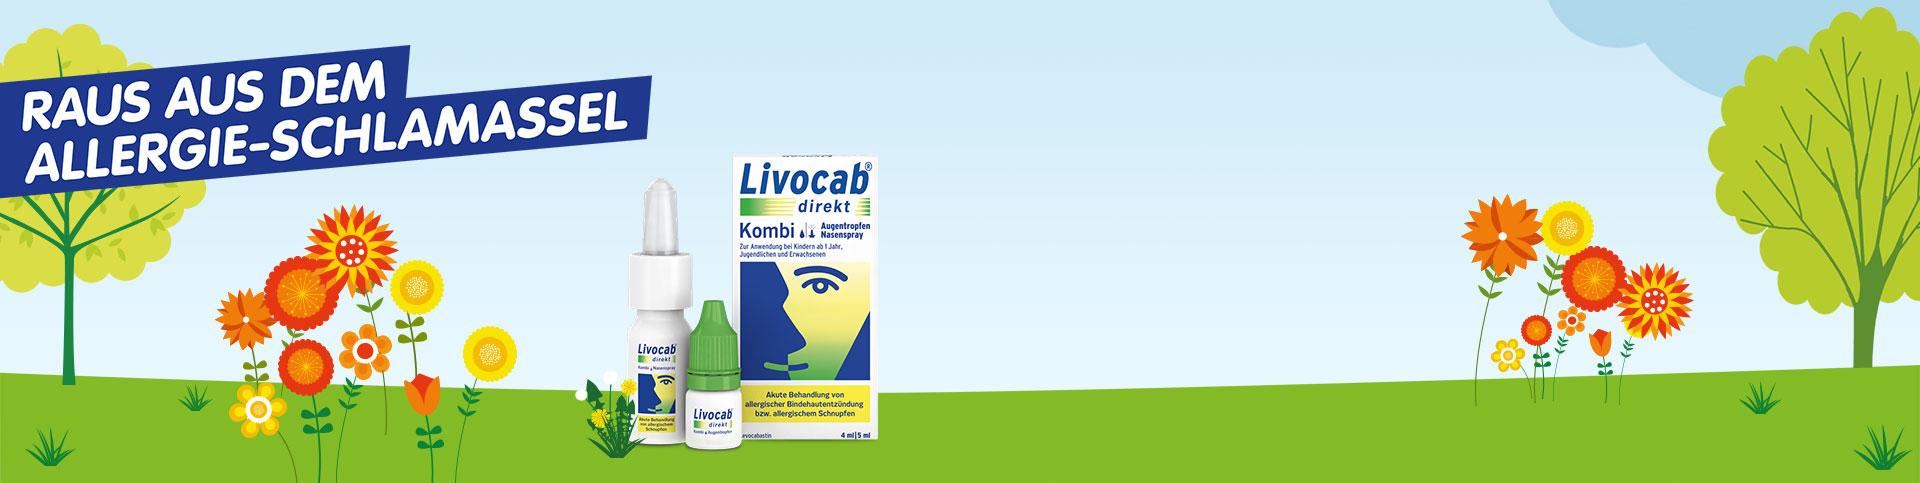 Comicwelt: Raus aus dem Allergieschlamassel - LIVOCAB® direkt